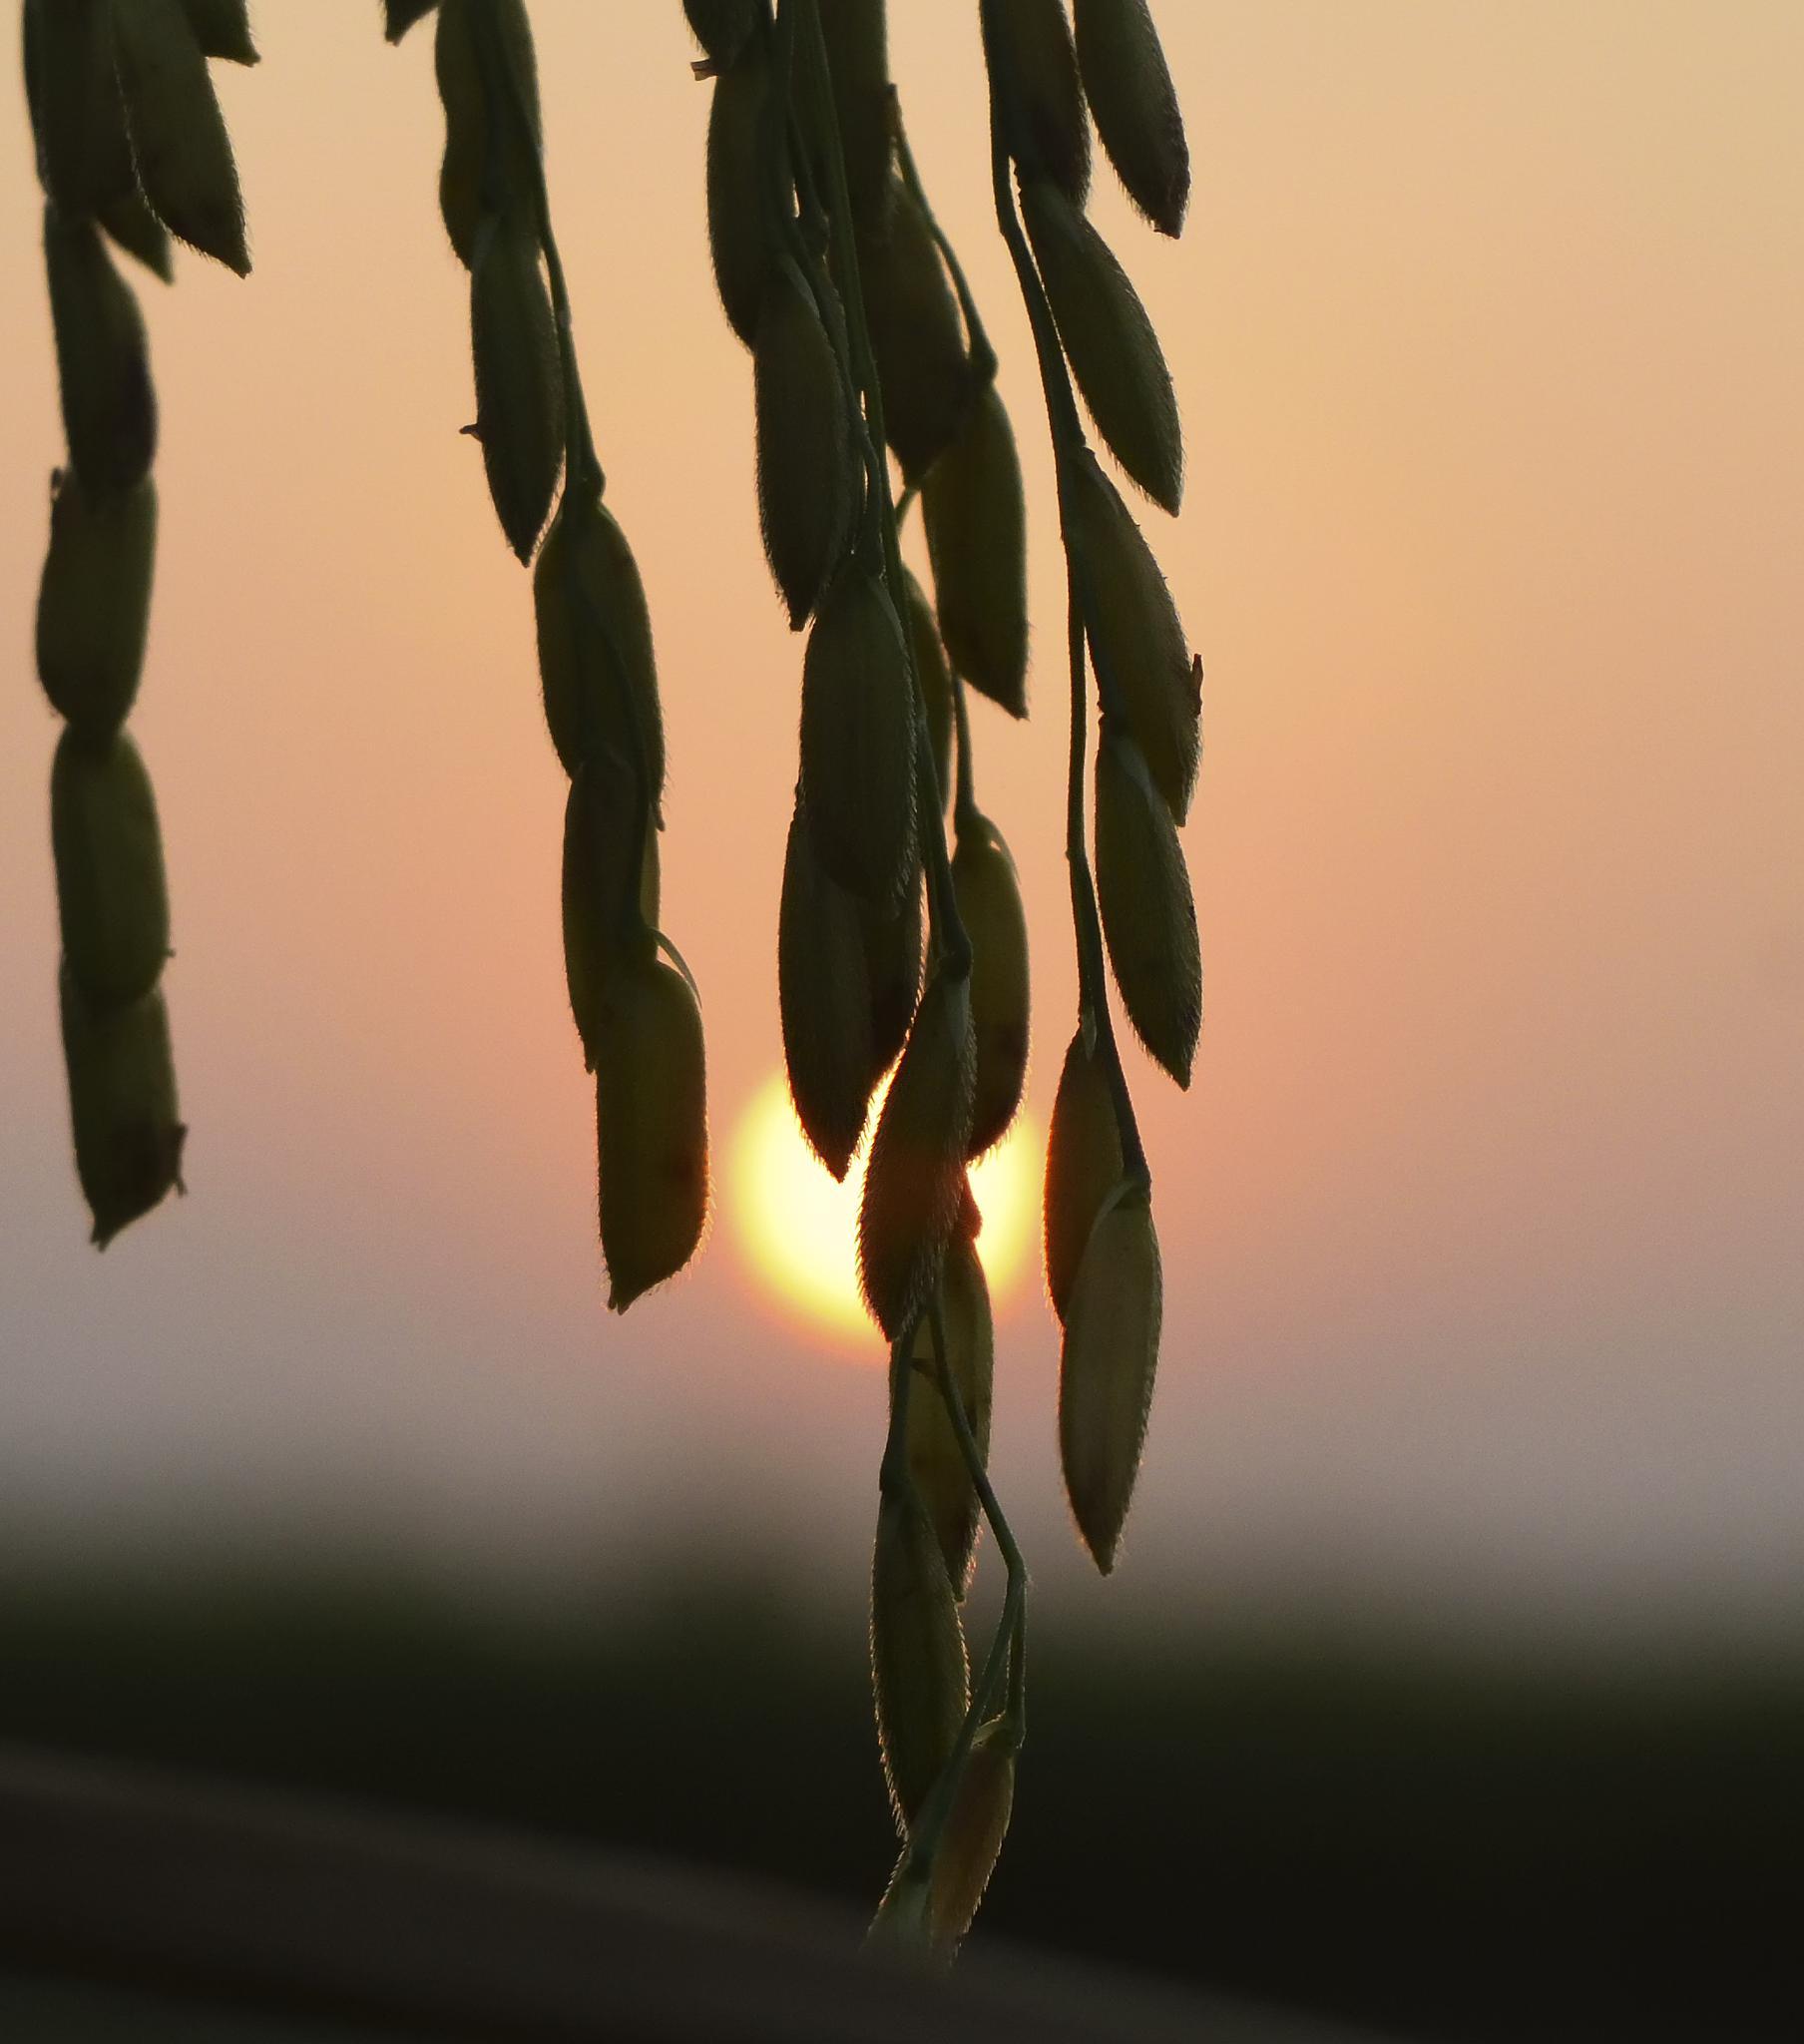 Paddy  by Joydip Ghosh